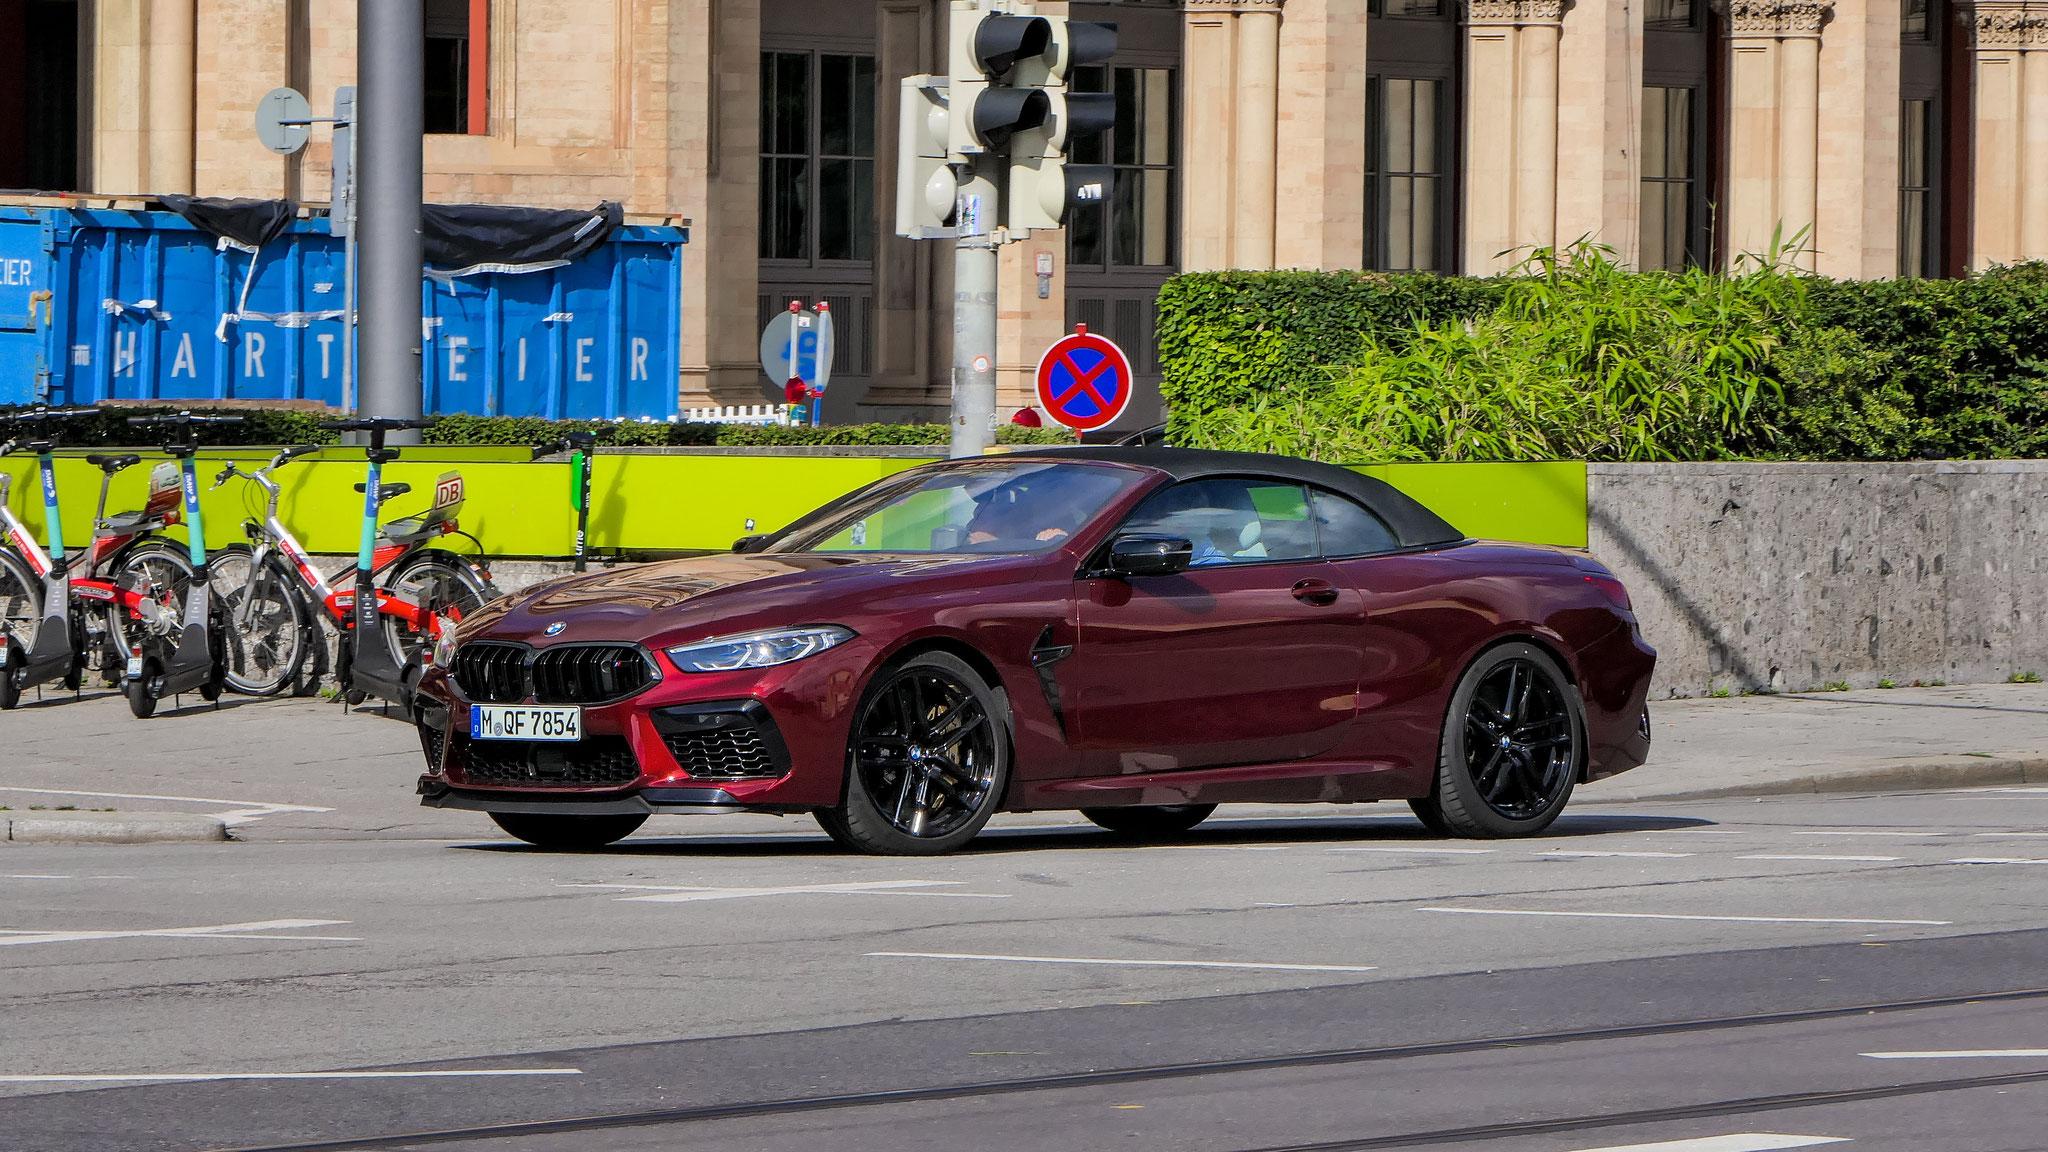 BMW M8 Competition Cabrio - M-QF-7854